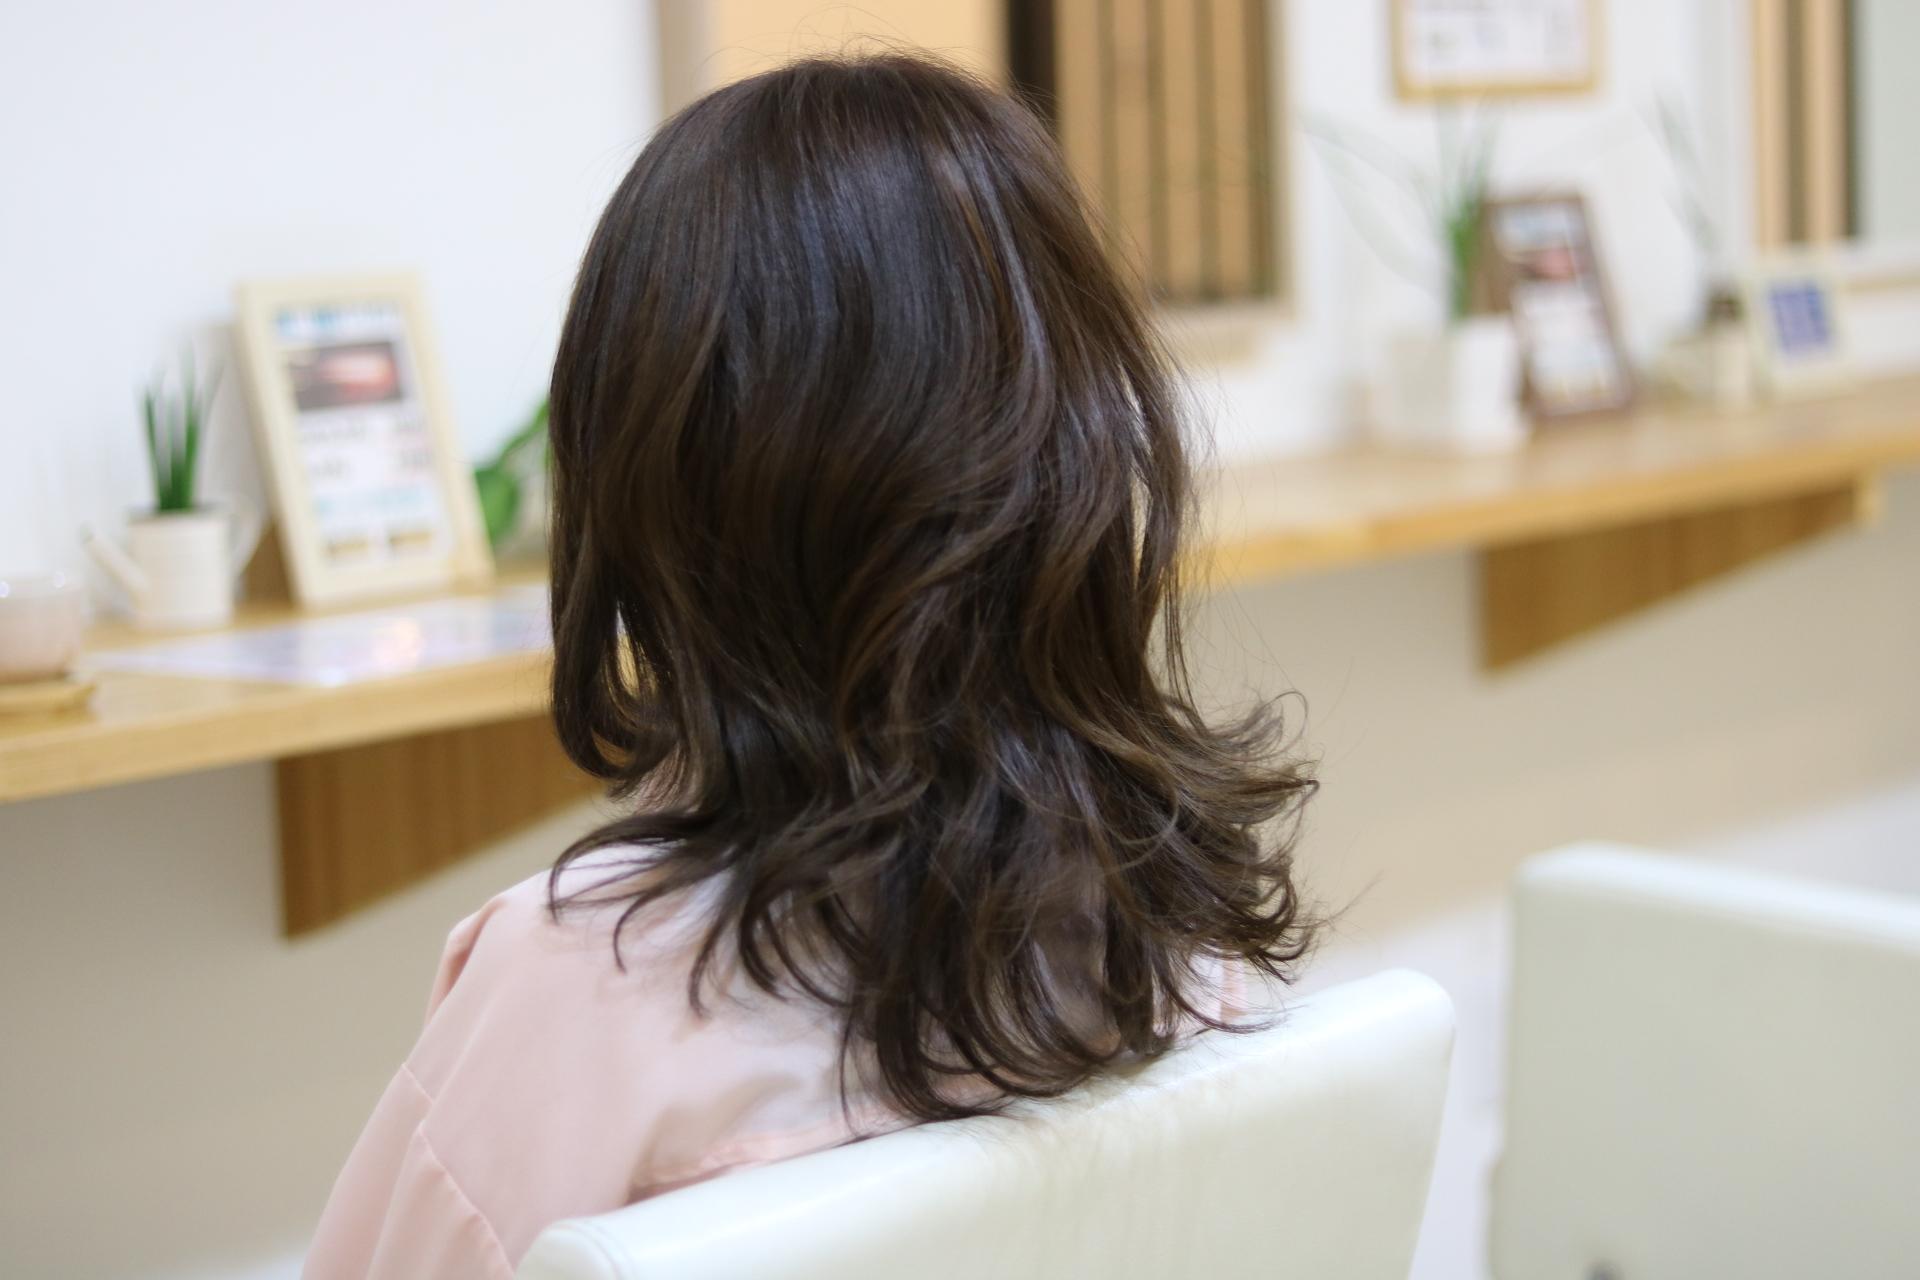 20161005173936_IMG_4840-1.JPG